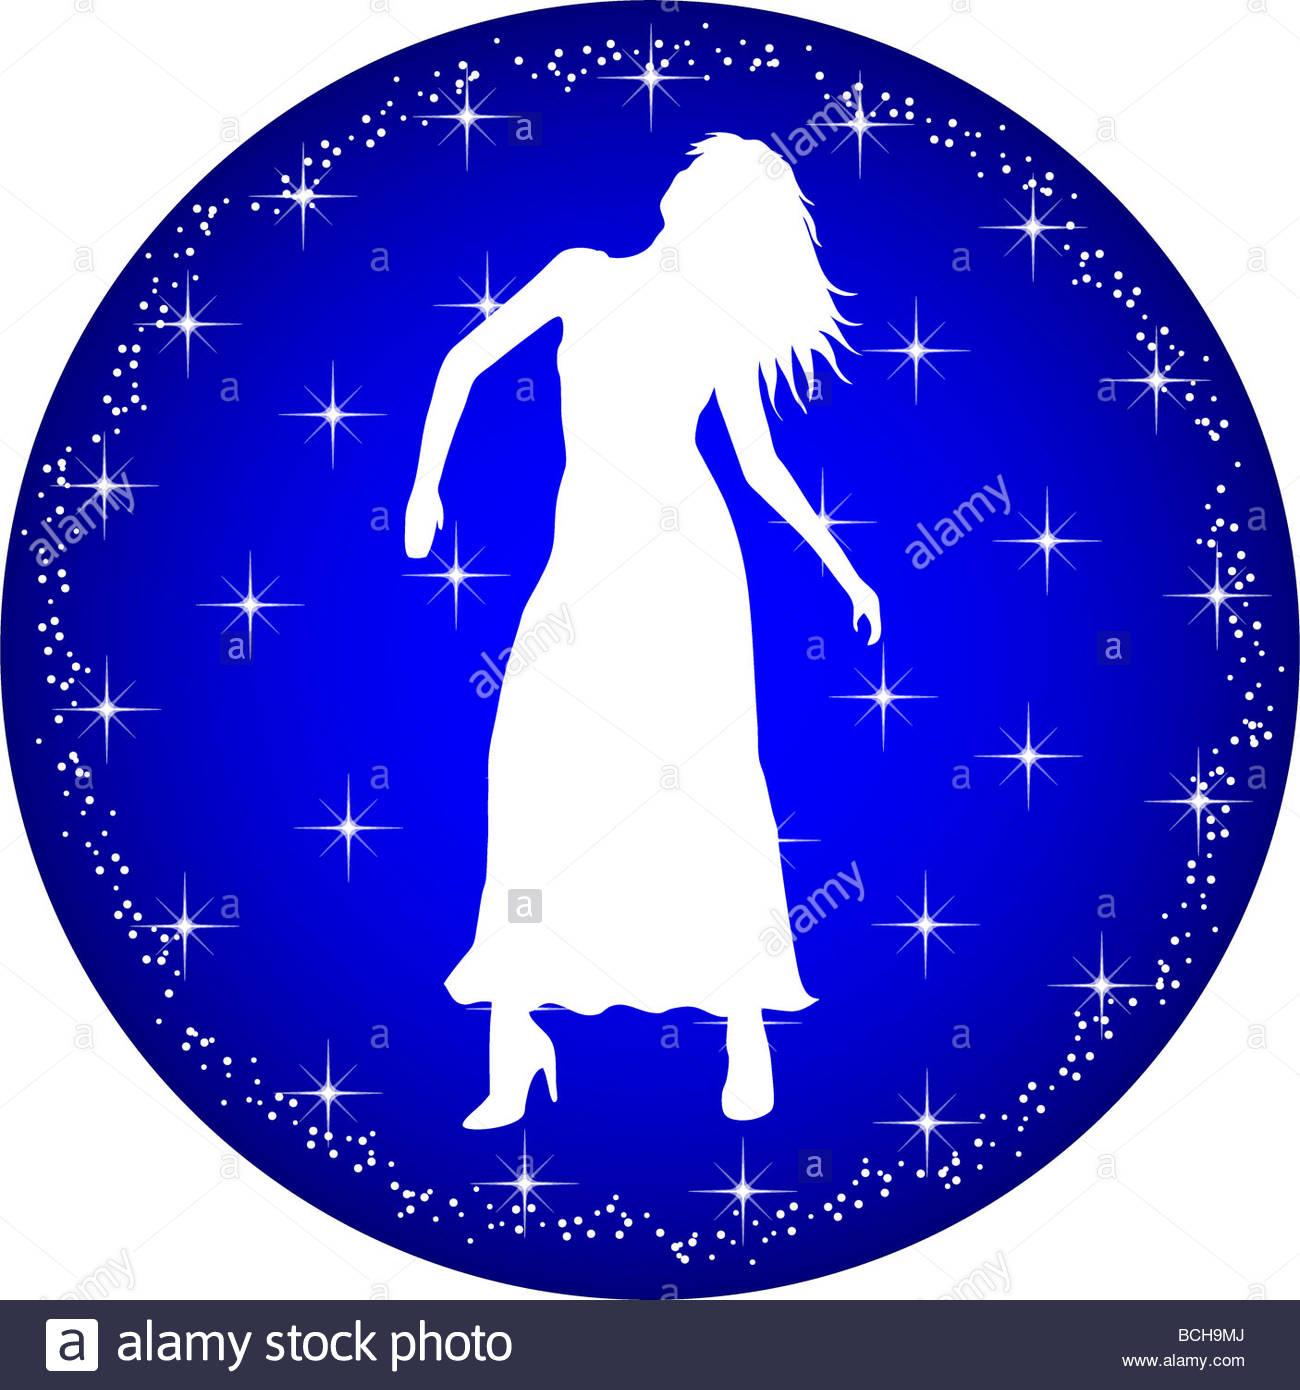 Aquarius, Aries, Astrology, Cancer, Capricorn, Constellation Stock.